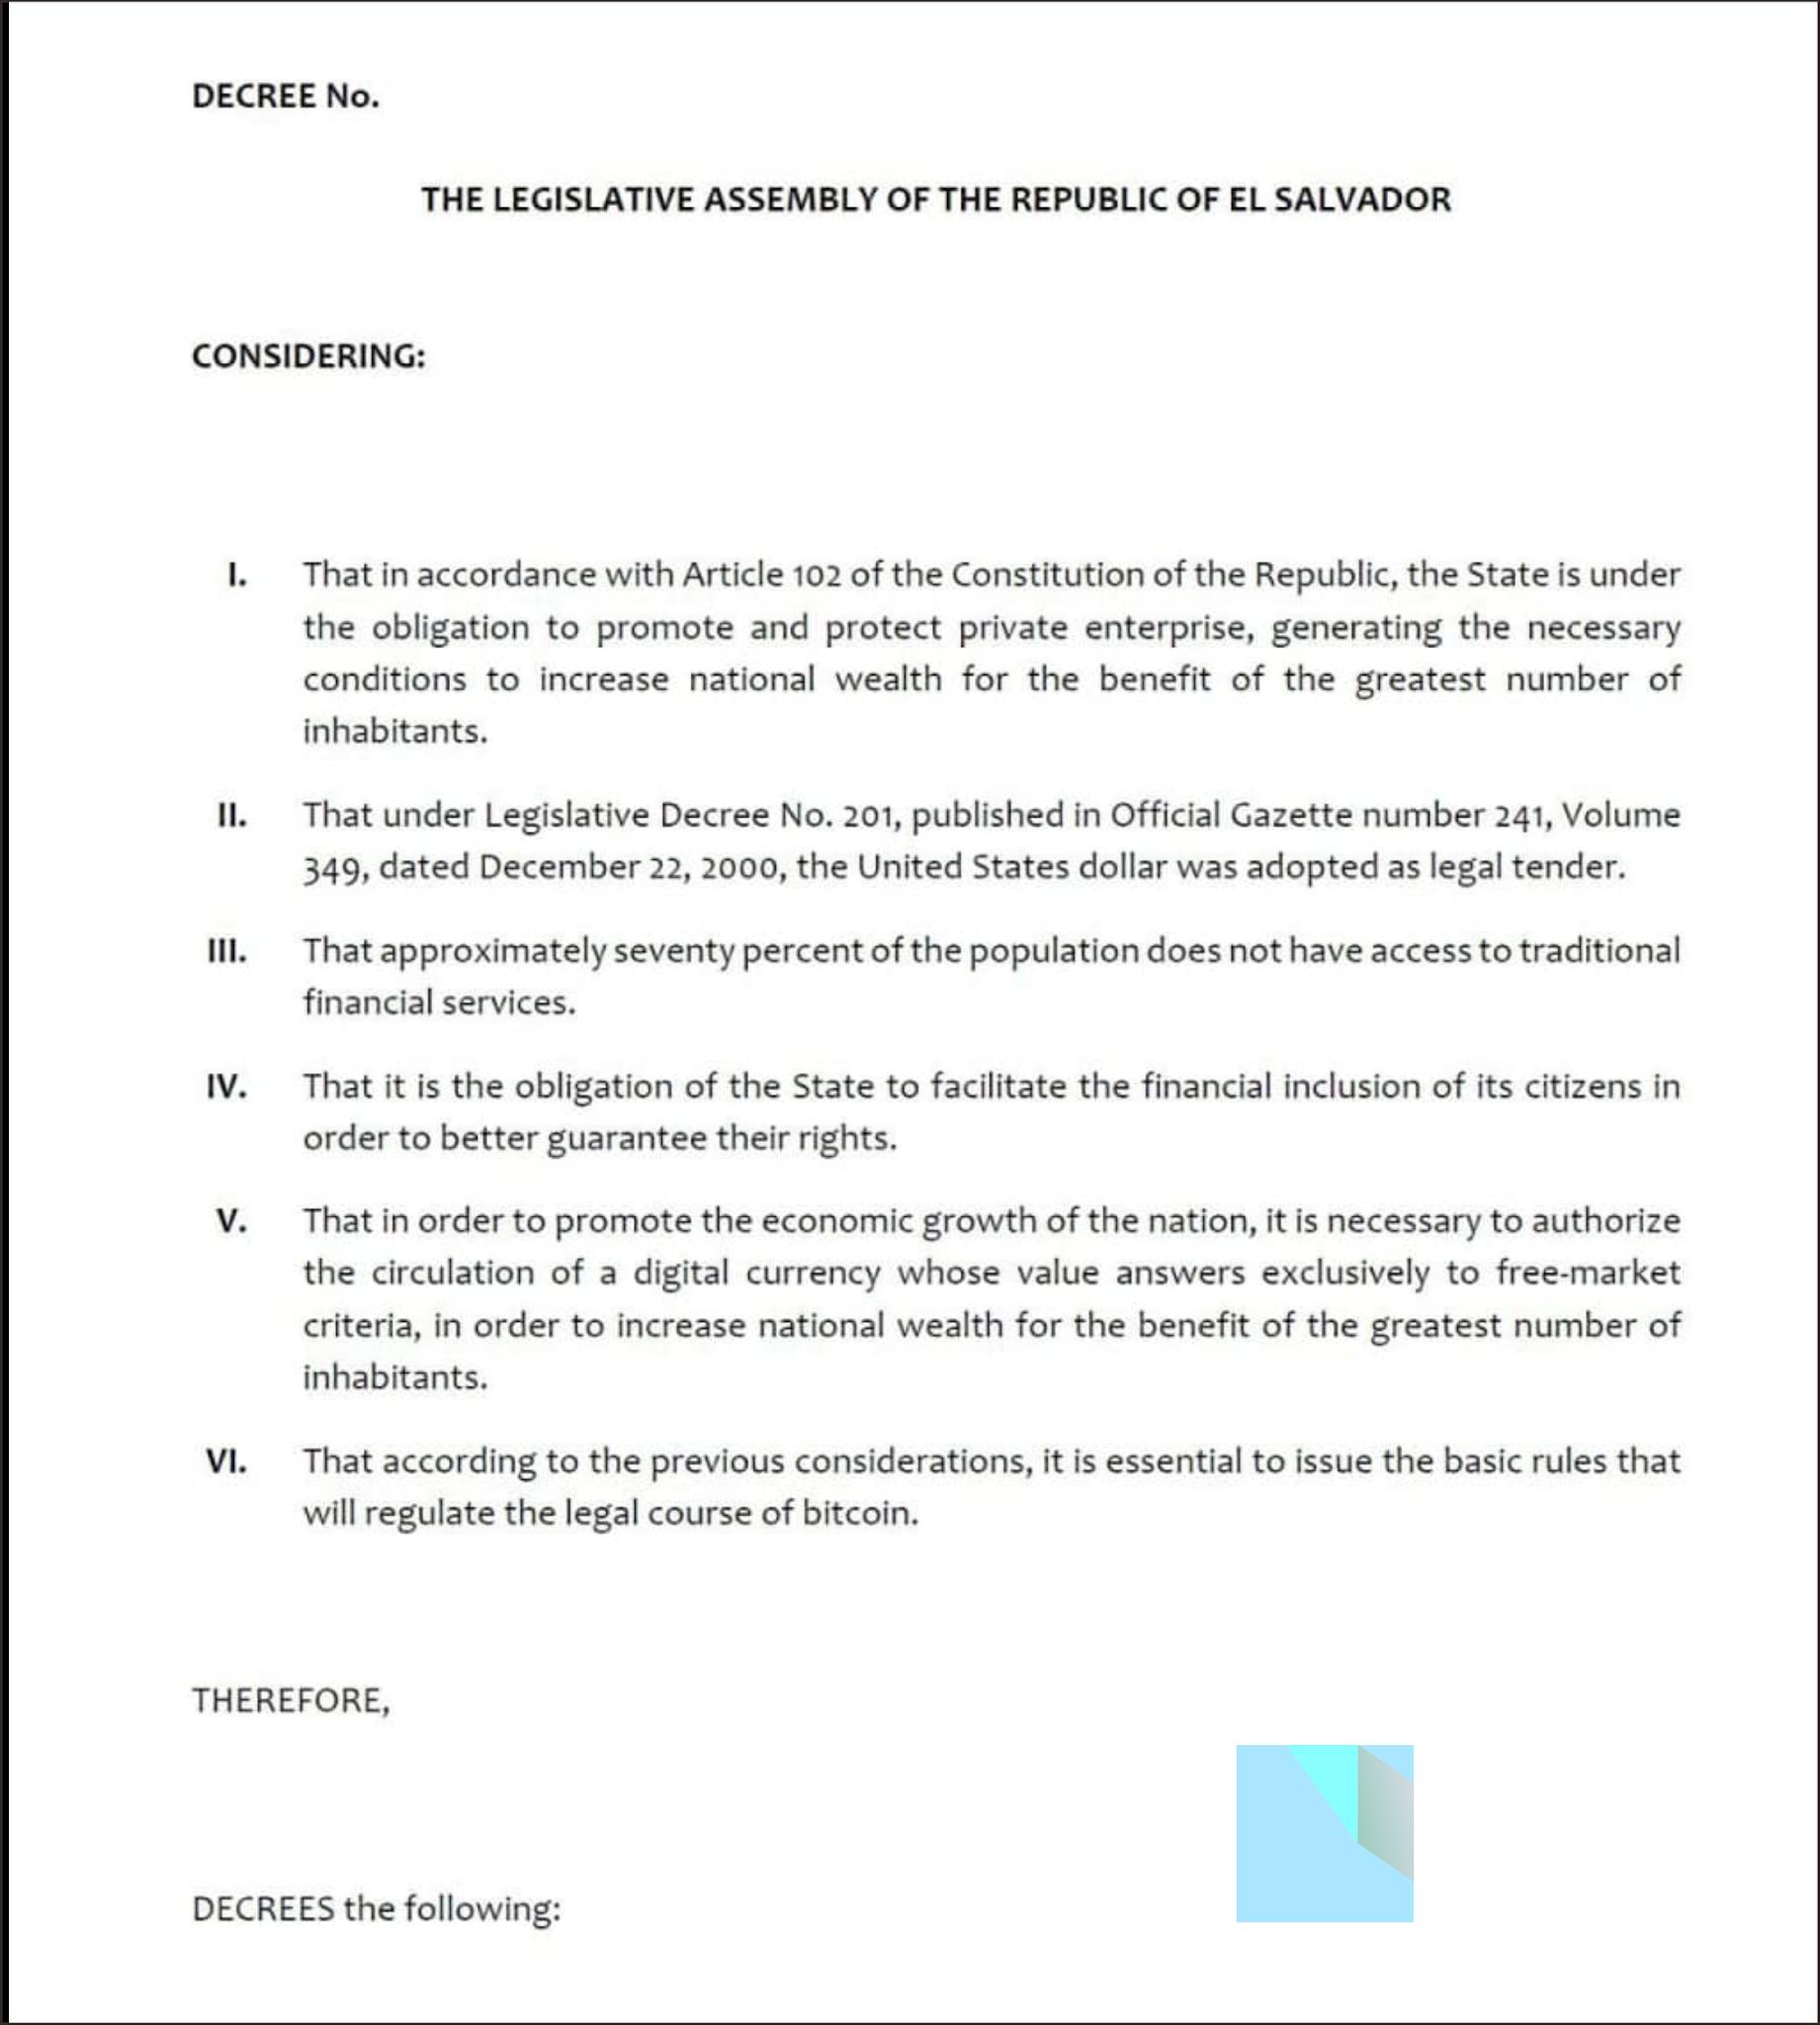 Doc Pengajuan undang-undang Bitcoin El Savador 2